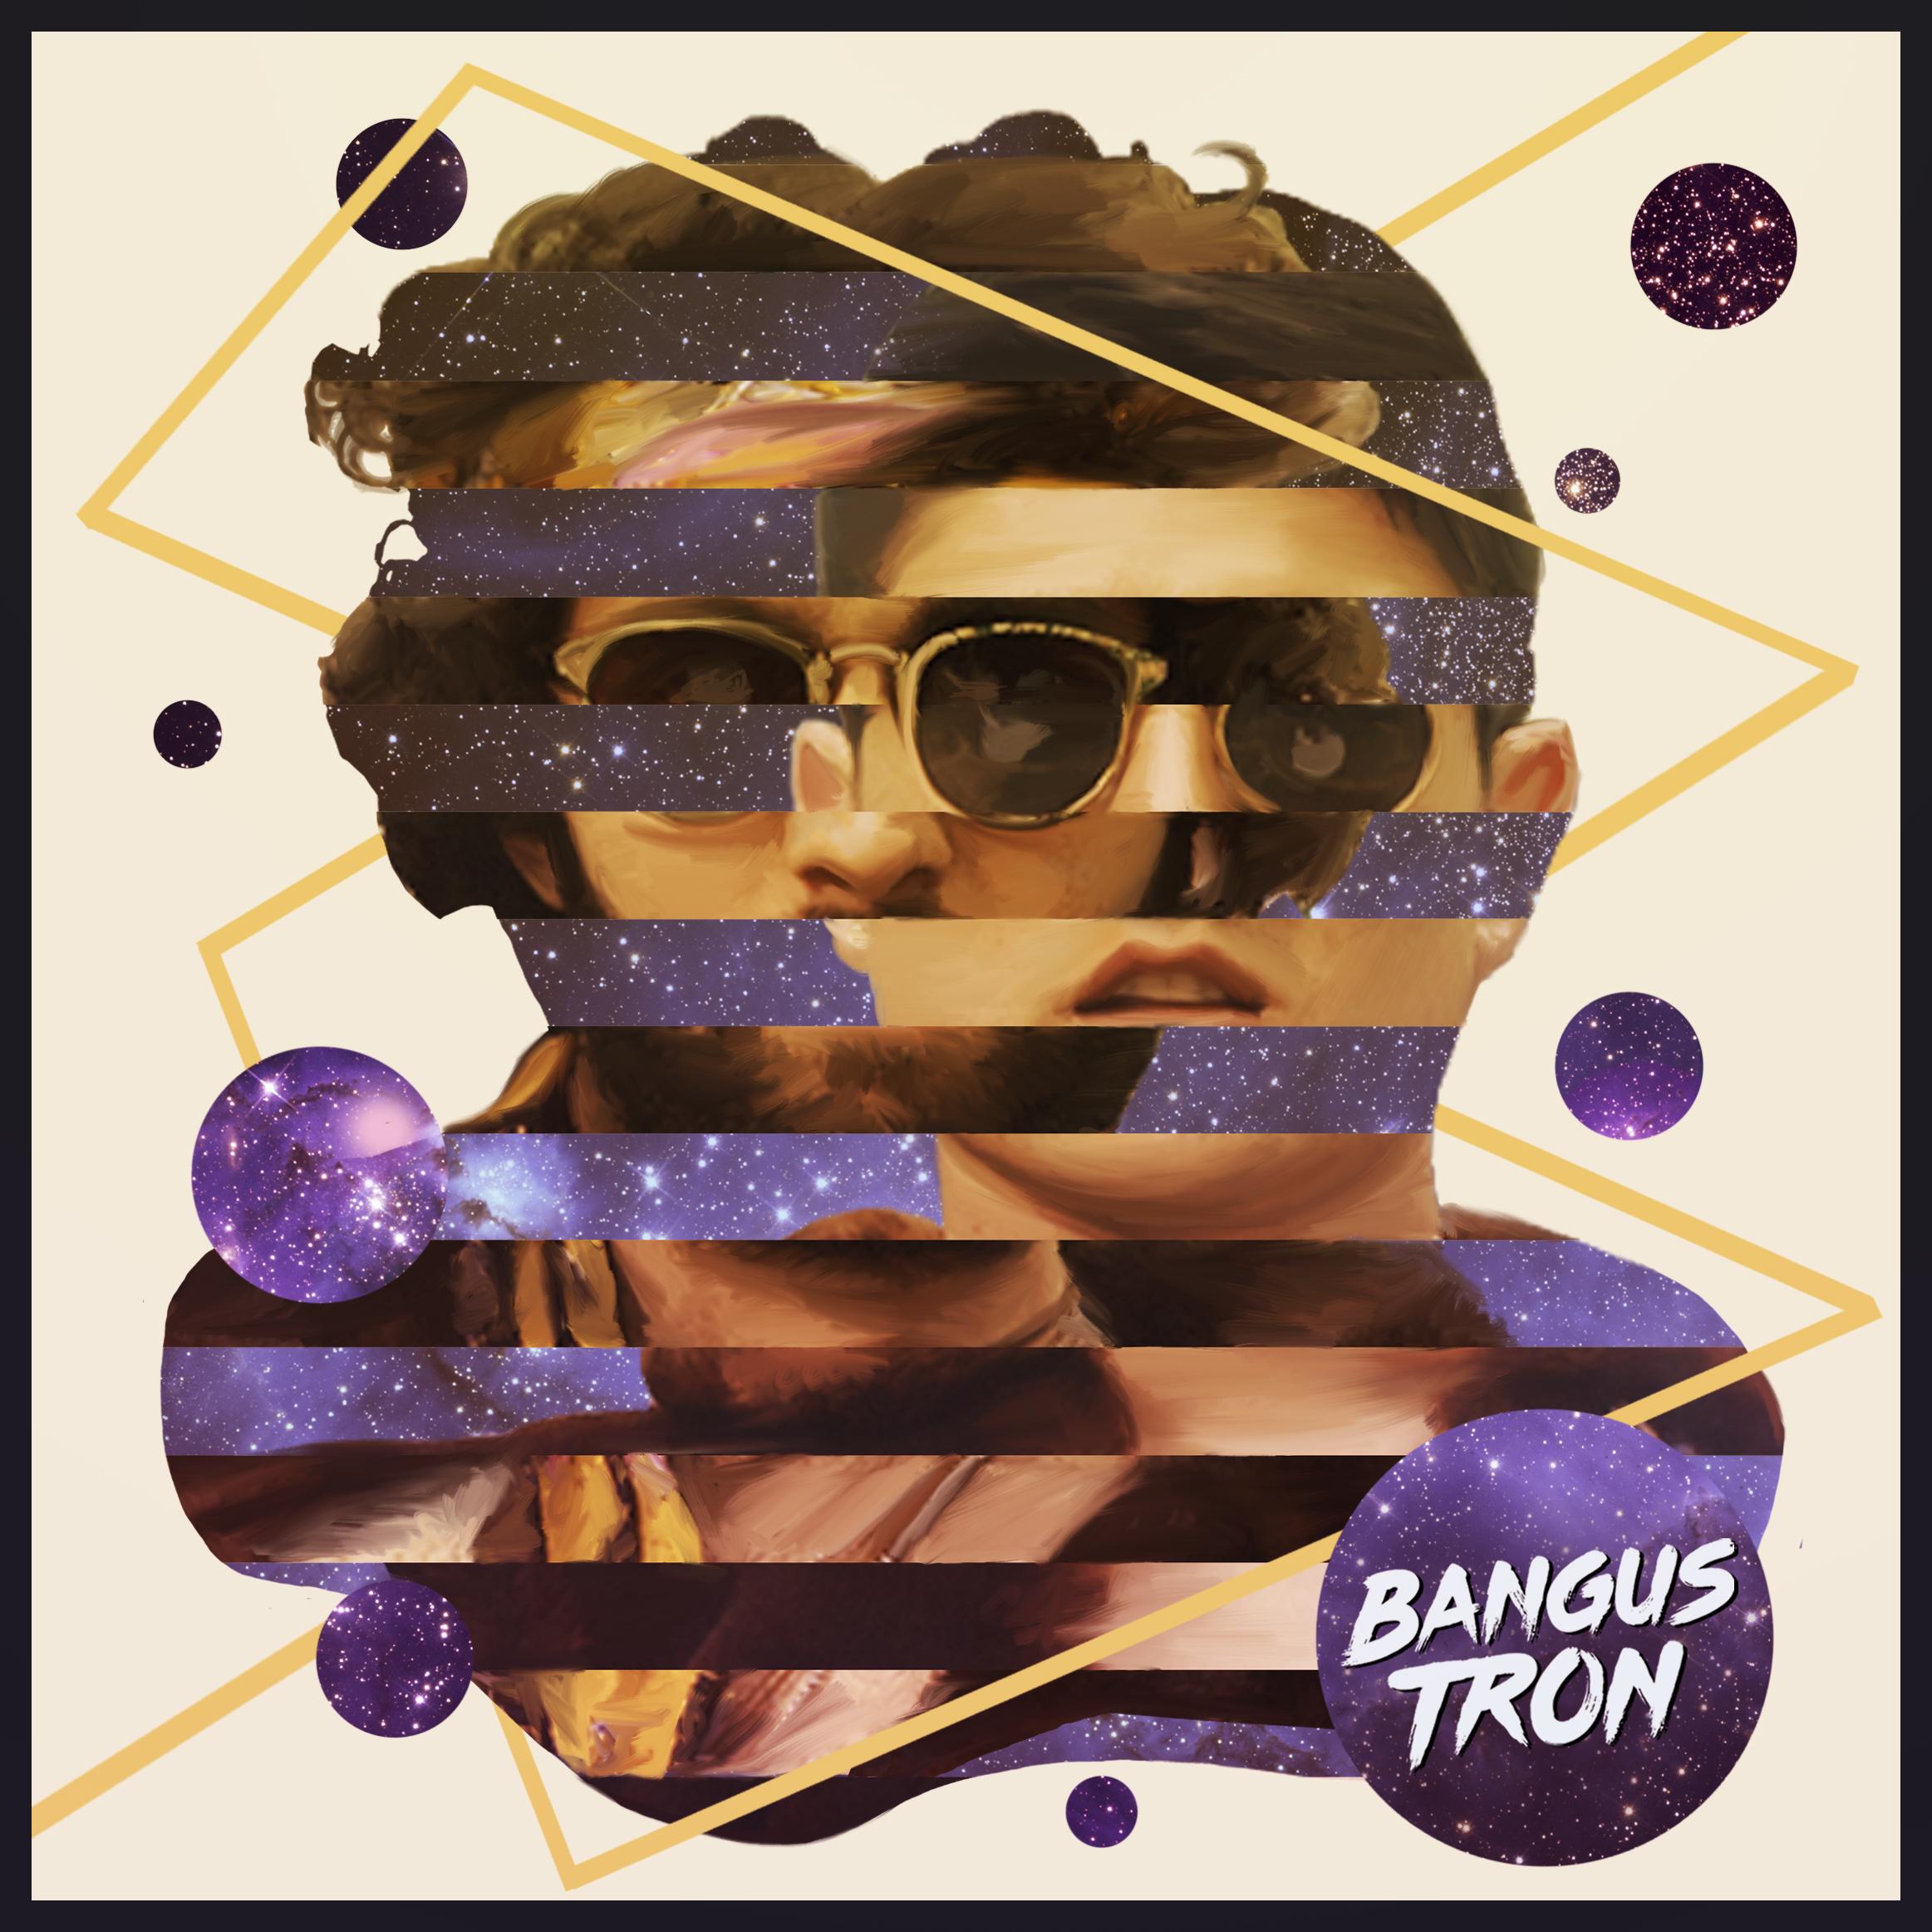 BangusTron_stripe_horizontal.jpg